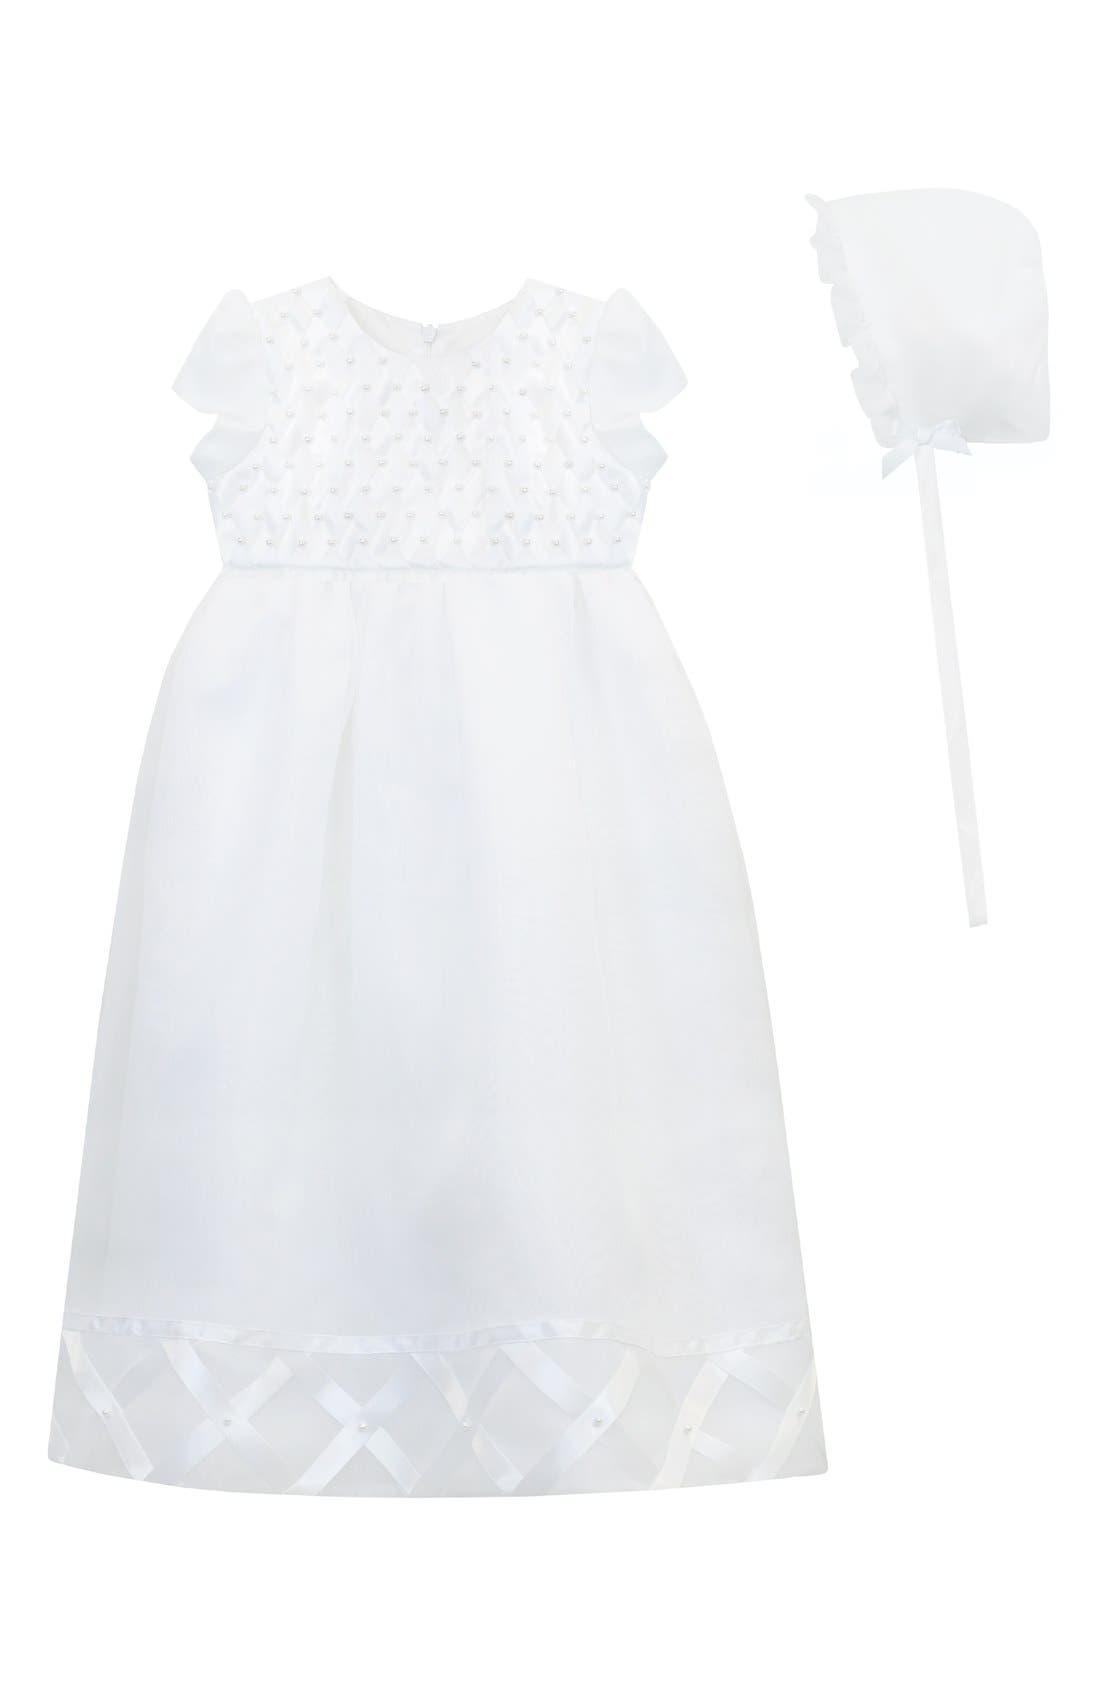 C.I. Castro & Co. Christening Gown & Bonnet (Baby Girls)